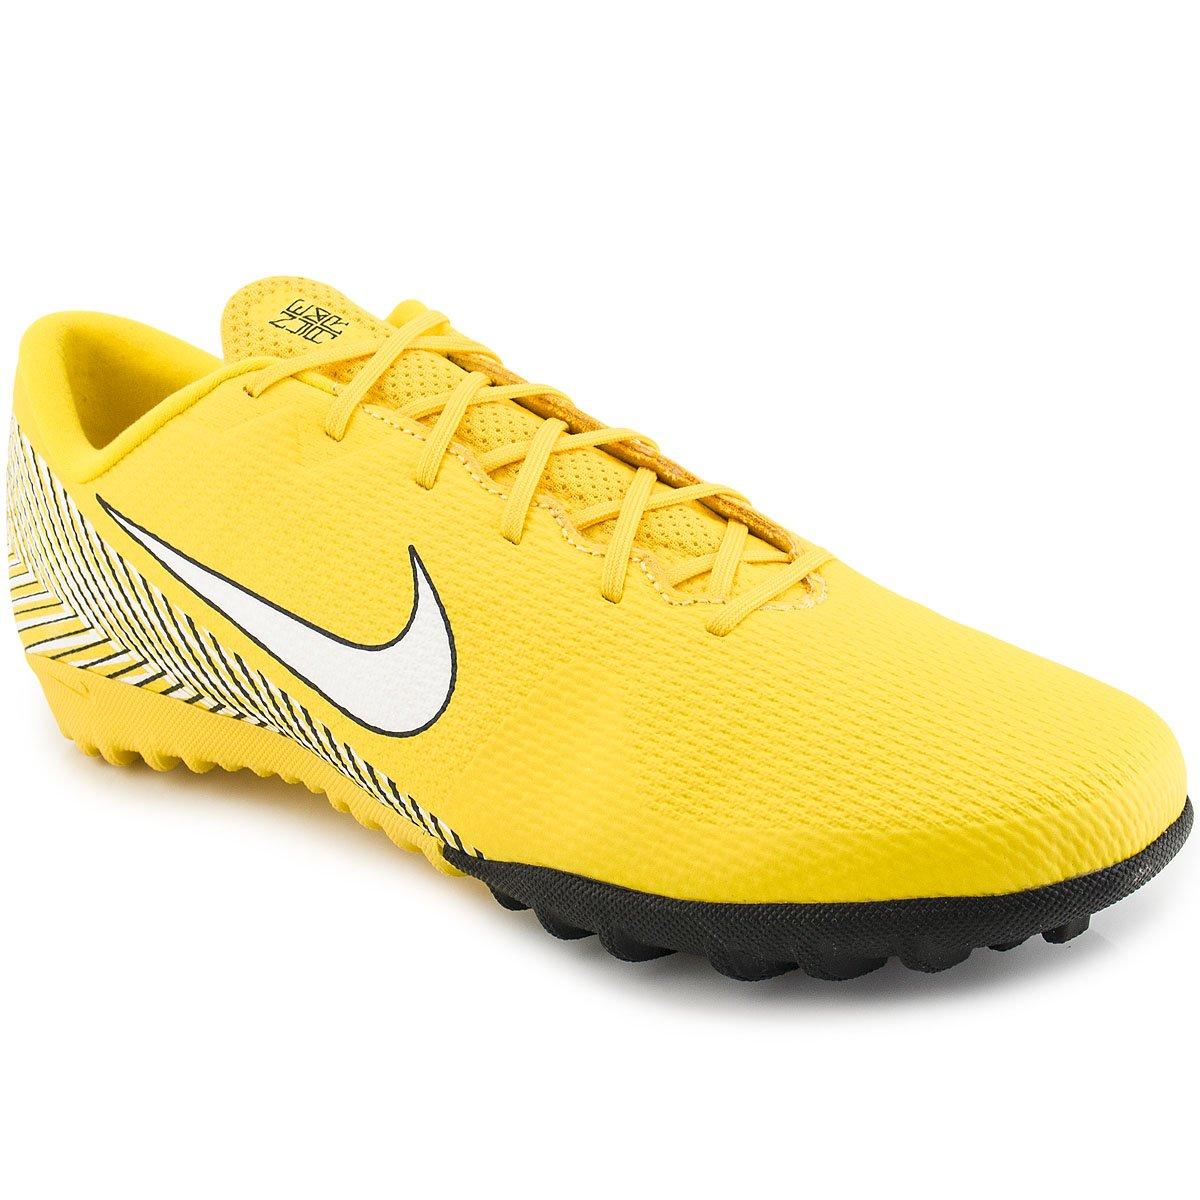 8fa83976c5bc7 Chuteira Nike Mercurial Vapor X 12 Neymar Jr. TF